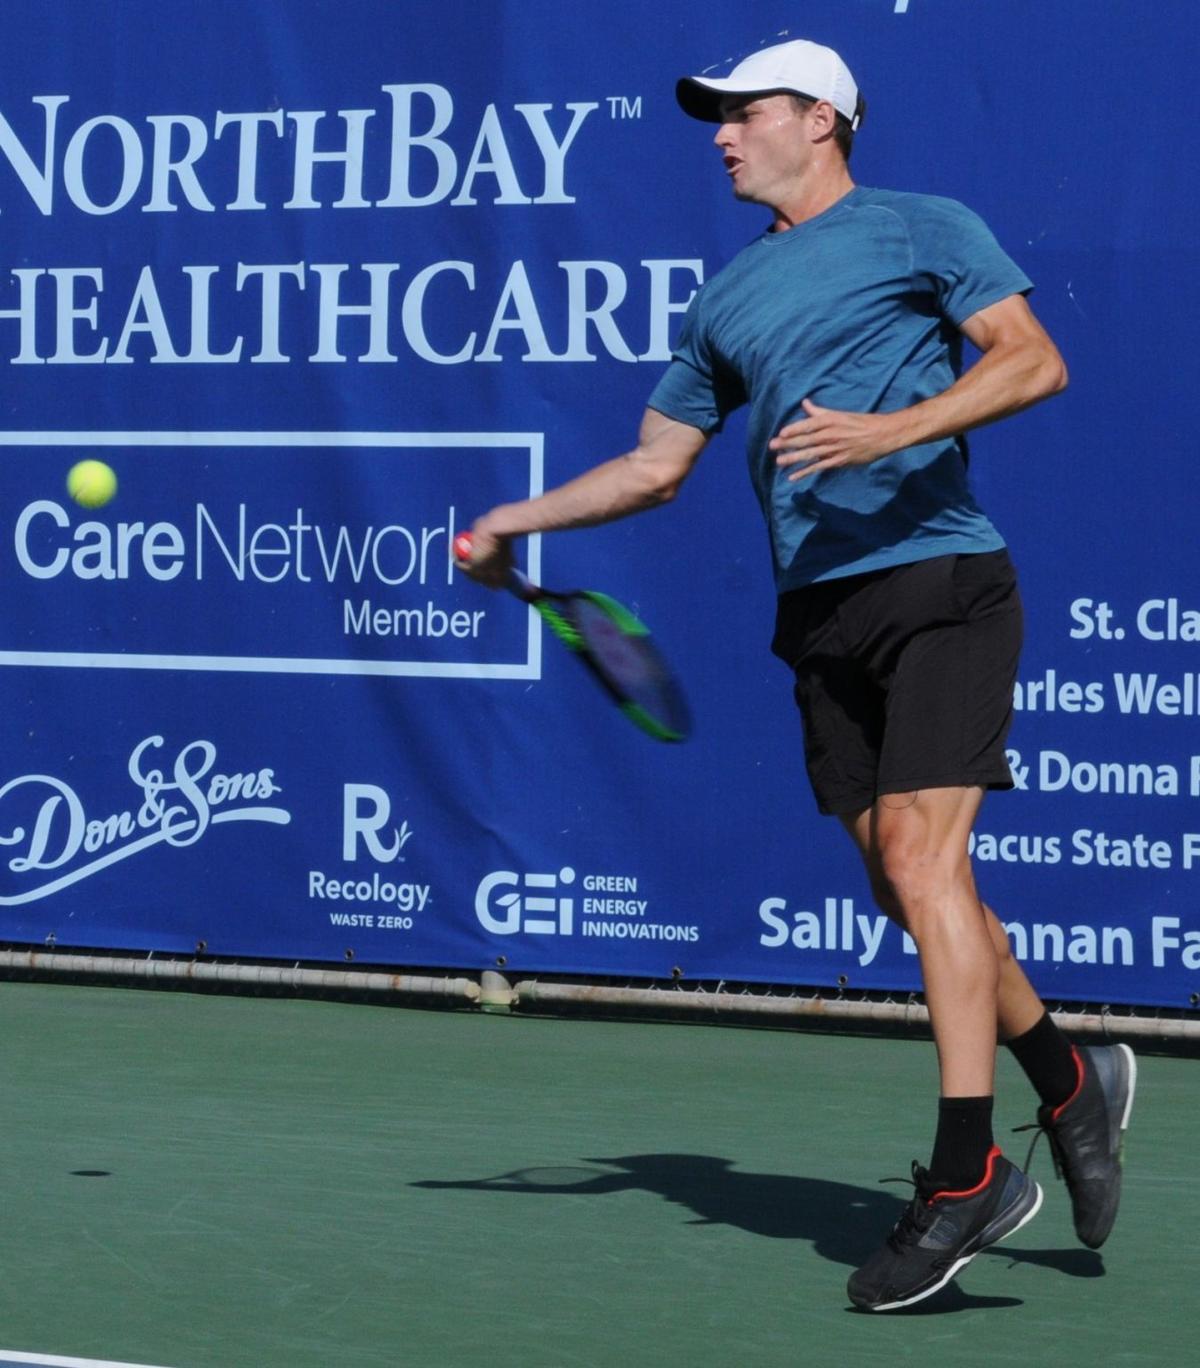 NorthBay Healthcare Men's Pro Championship